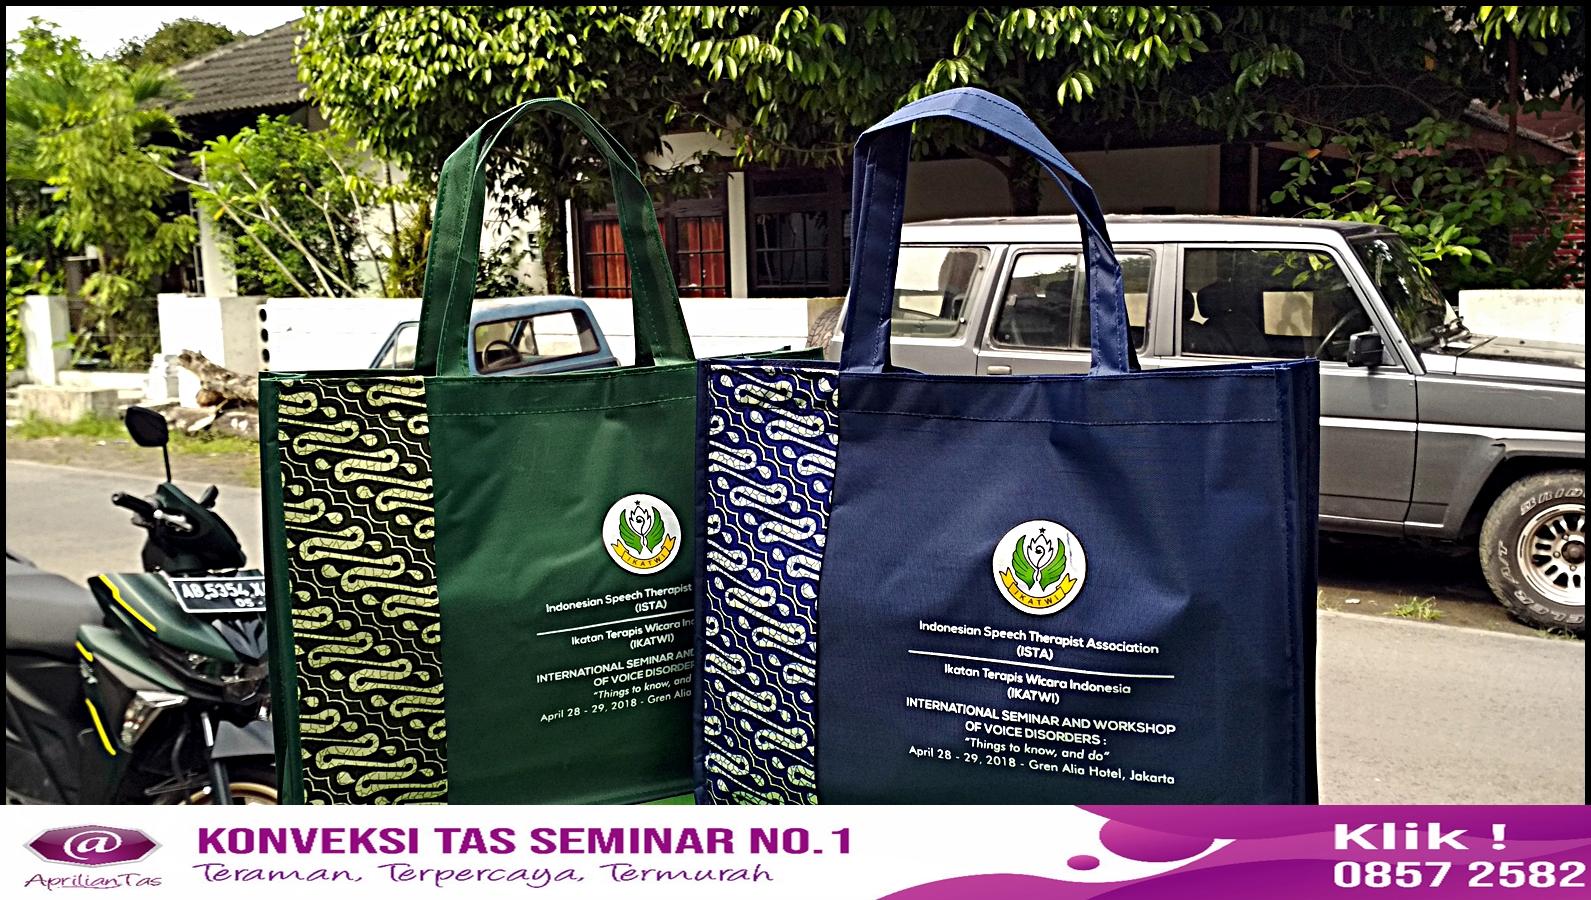 Pesan Tas Seminar Bandung Harga Hemat di Maklon Tas No 1  pabrik tas jakarta,pabrik tas seminar,paket seminar kit,produsen tas,